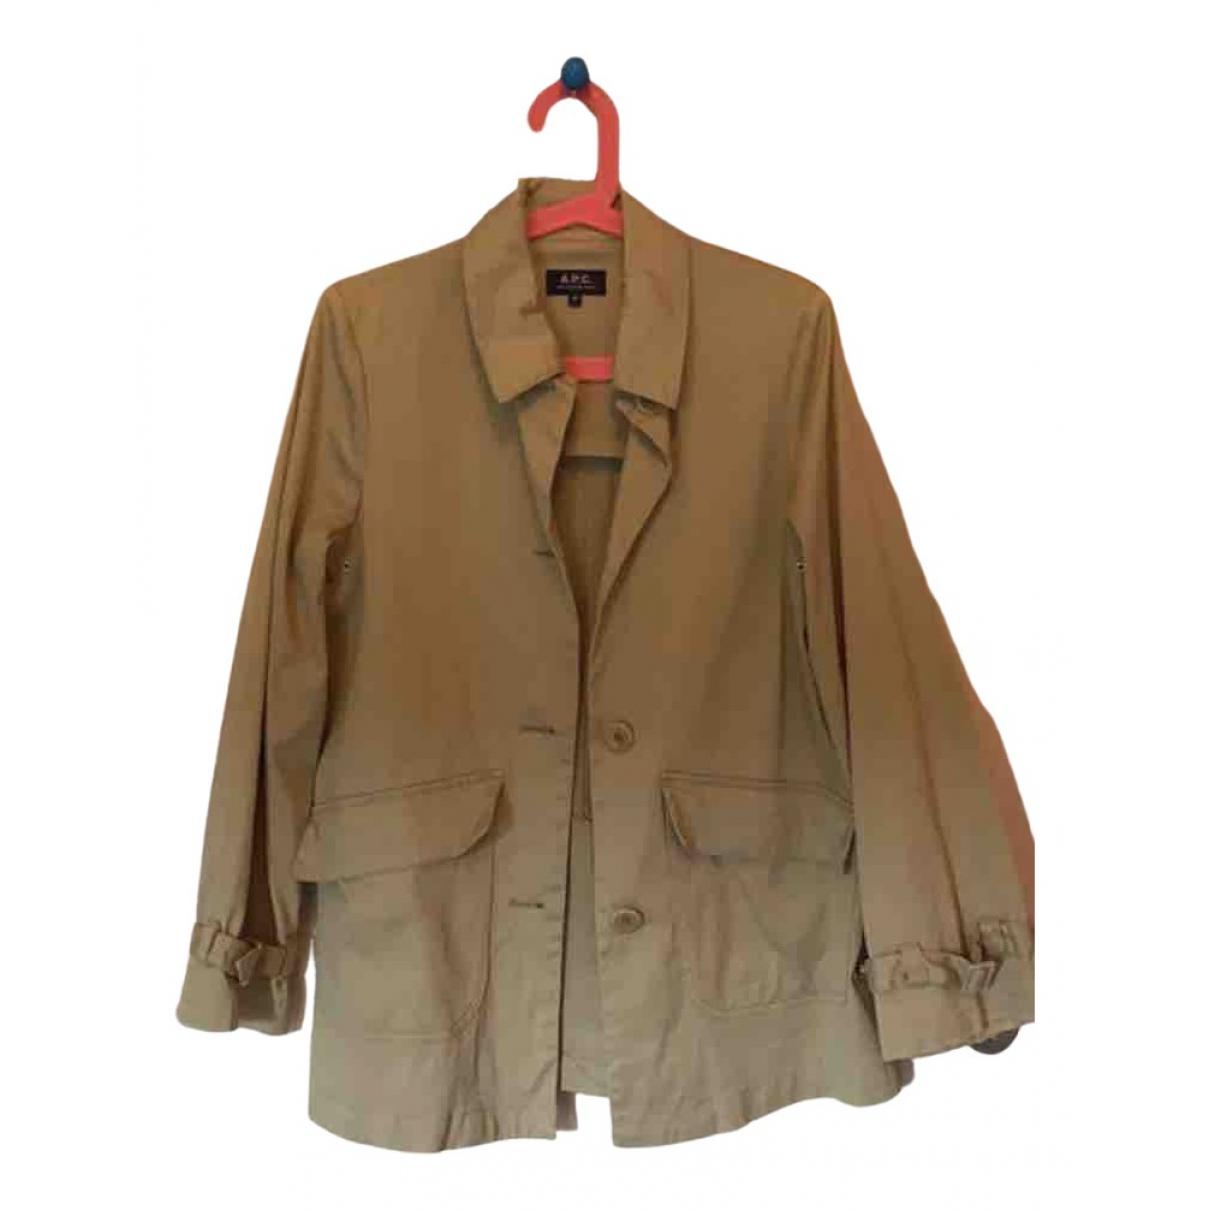 Apc \N Beige Cotton jacket for Women XS International